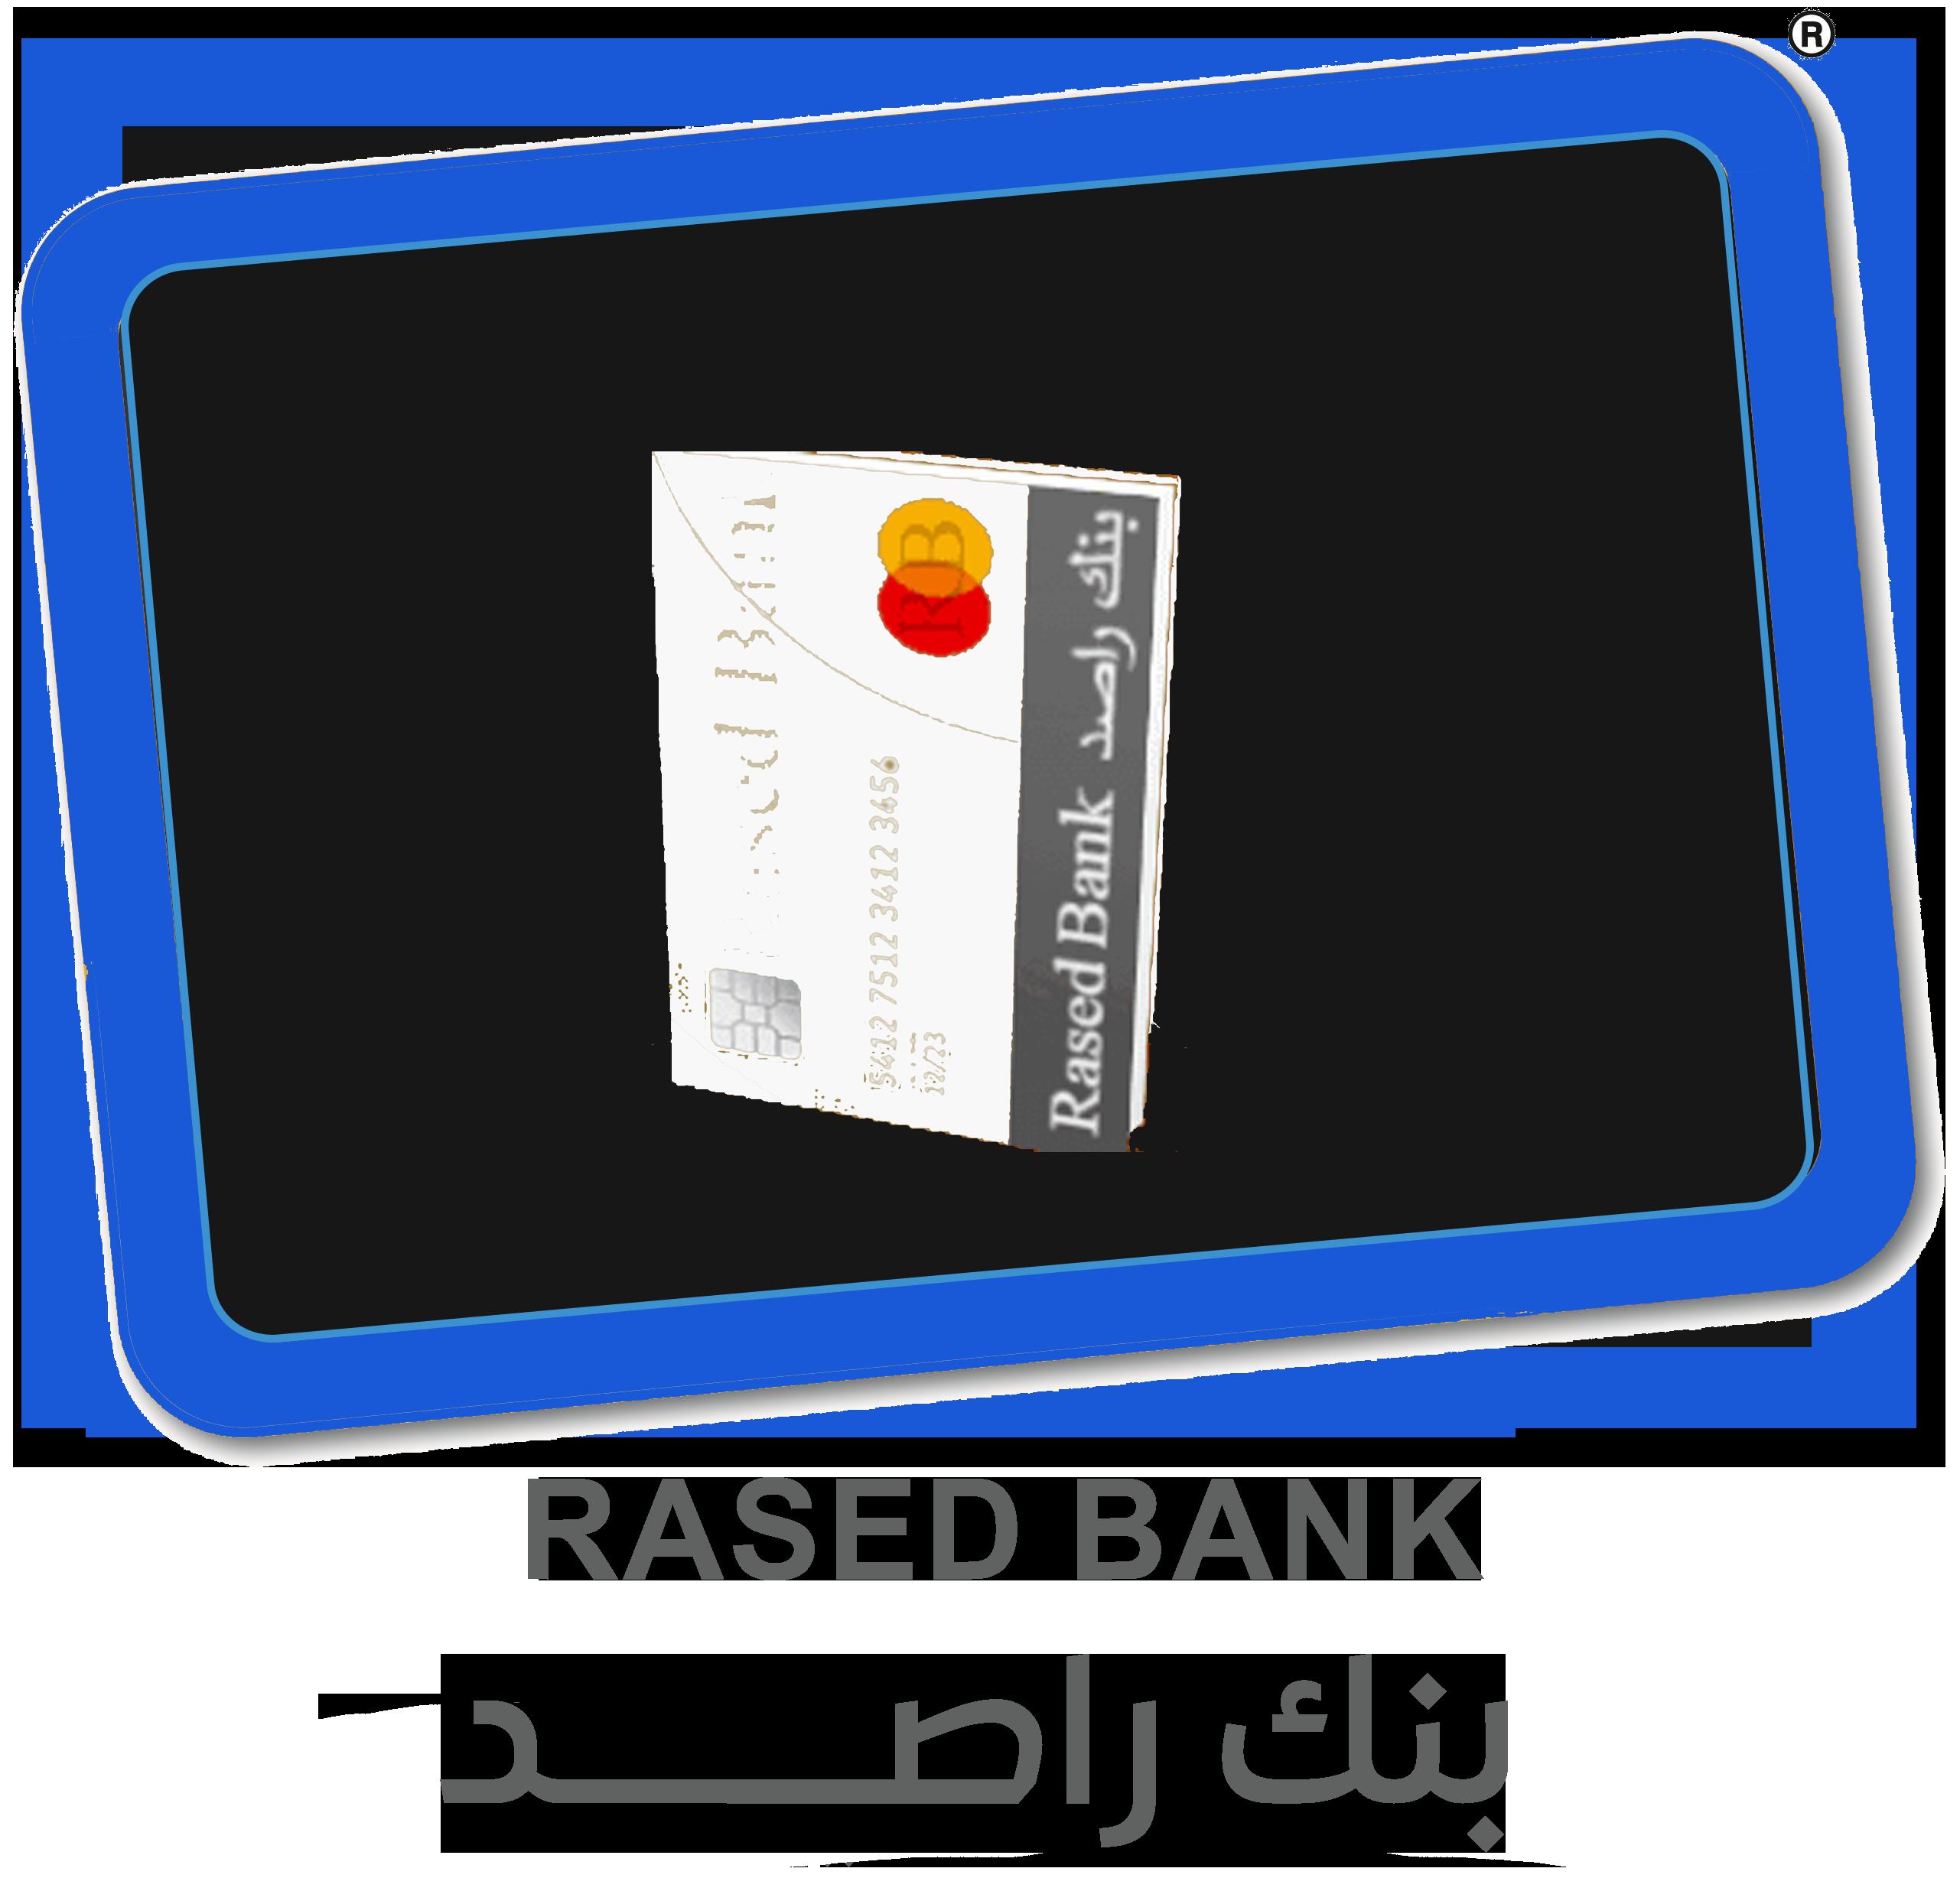 rased - bank